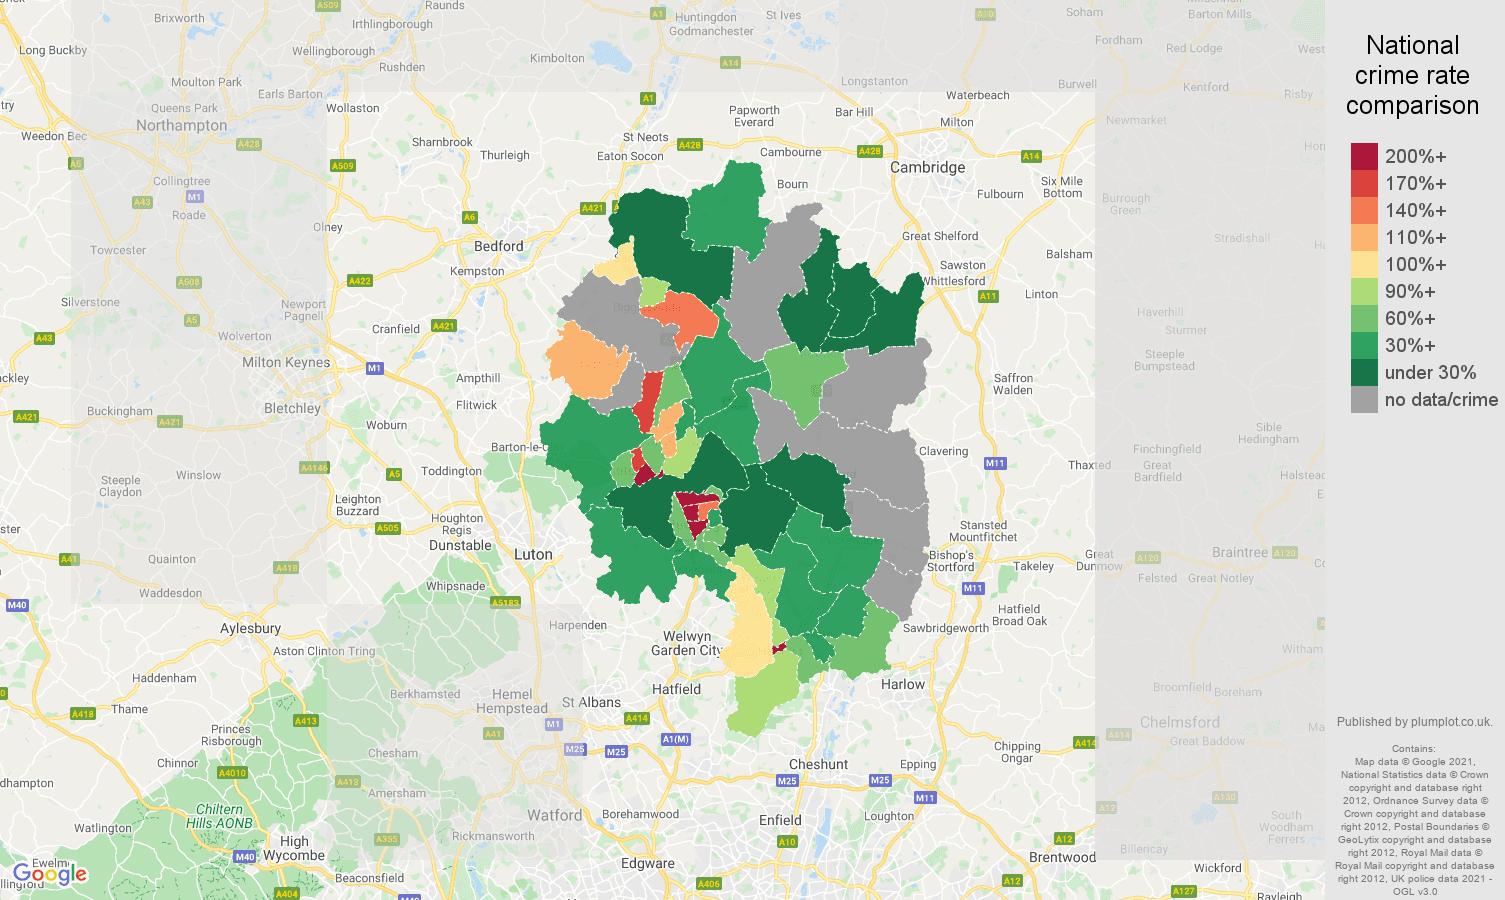 Stevenage bicycle theft crime rate comparison map